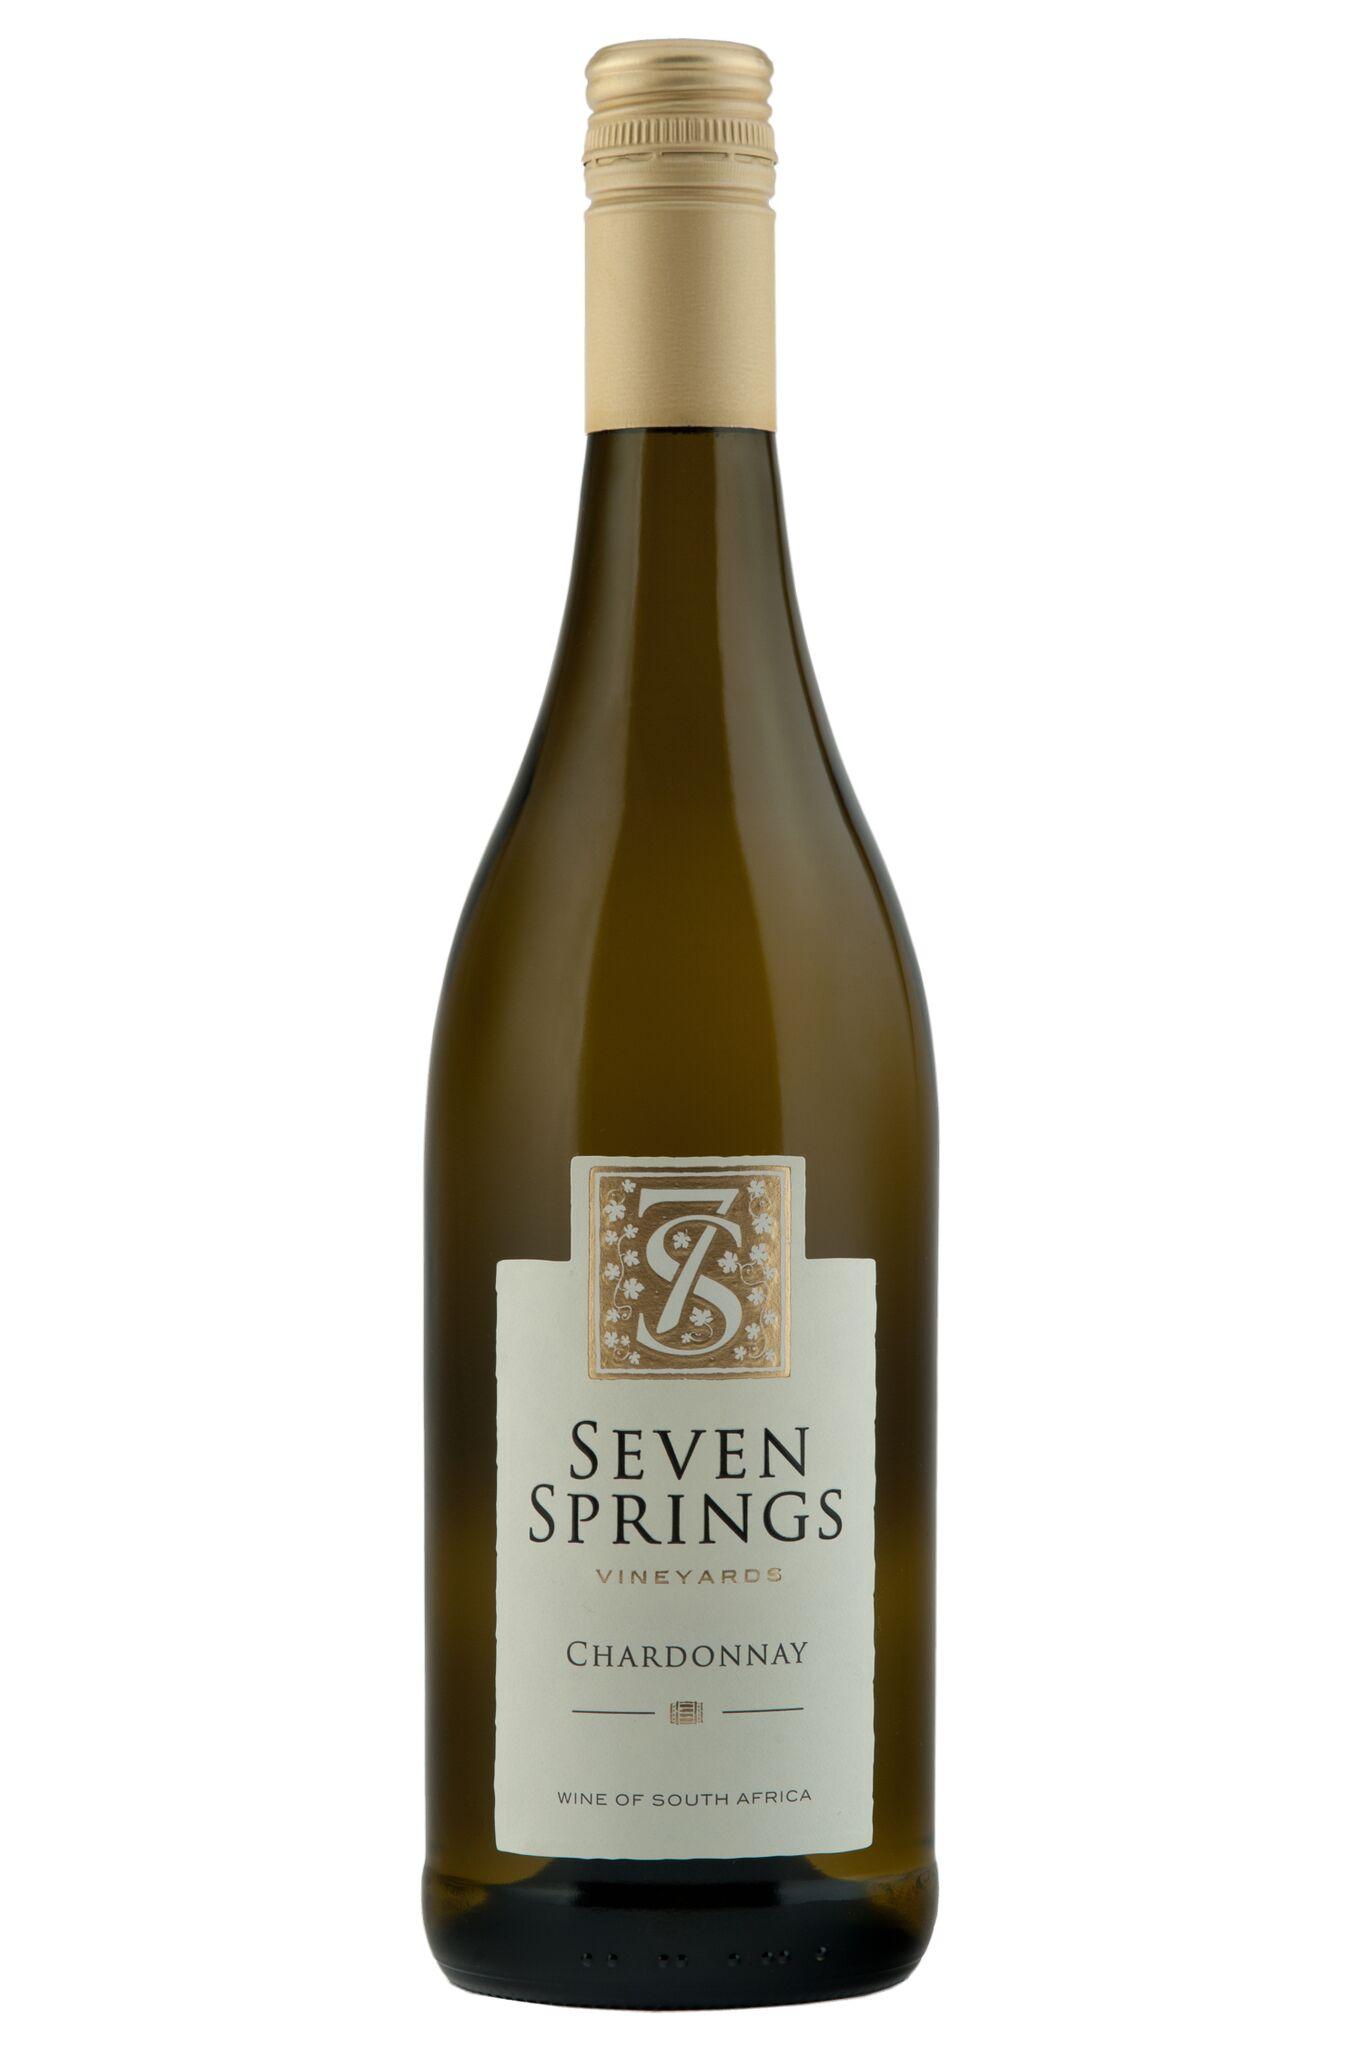 Seven Springs Chardonnay